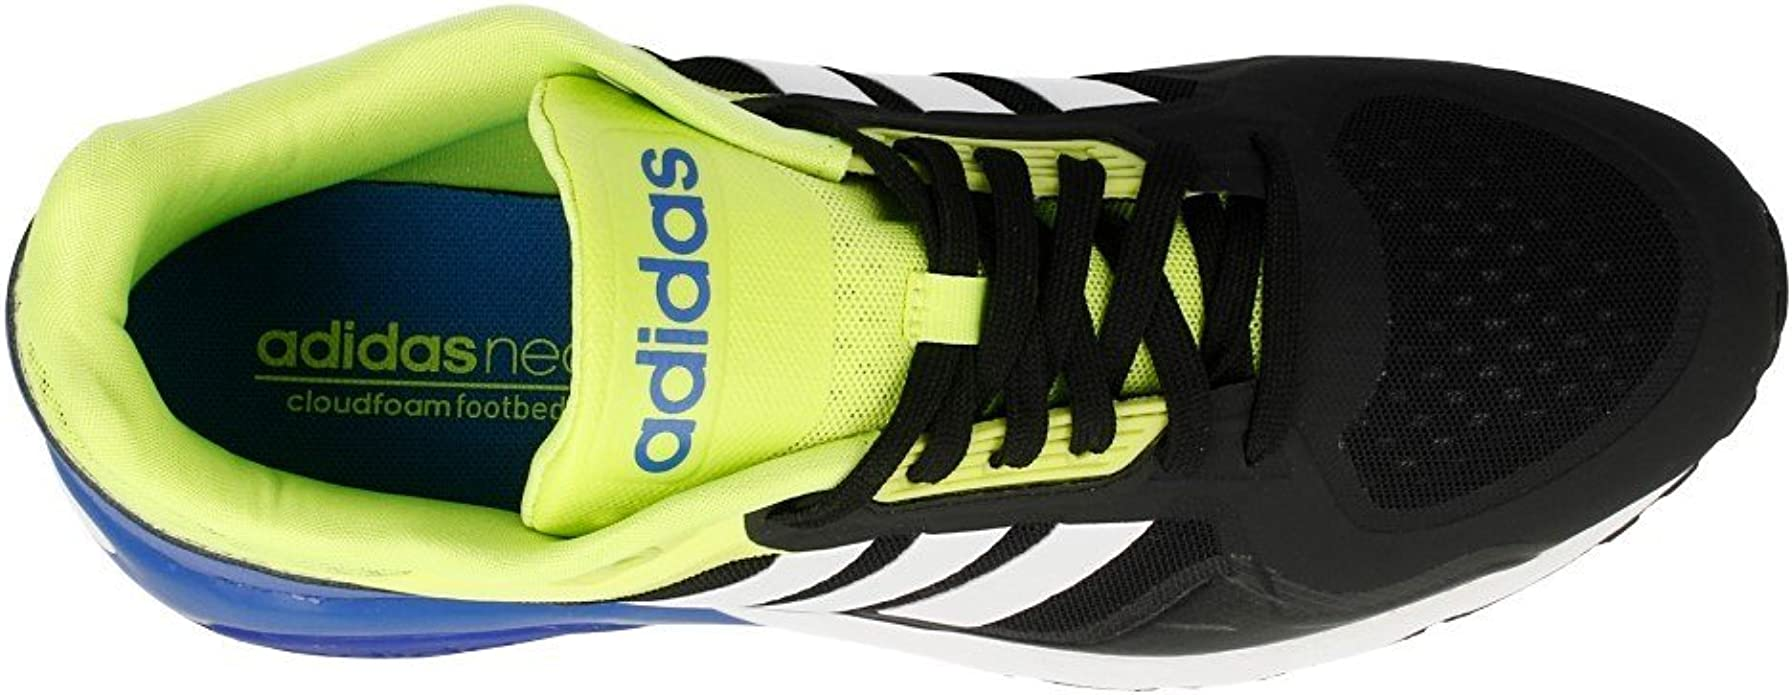 Adidas RUN9TIS TM F99268 Color Celadon Navy Blue Black